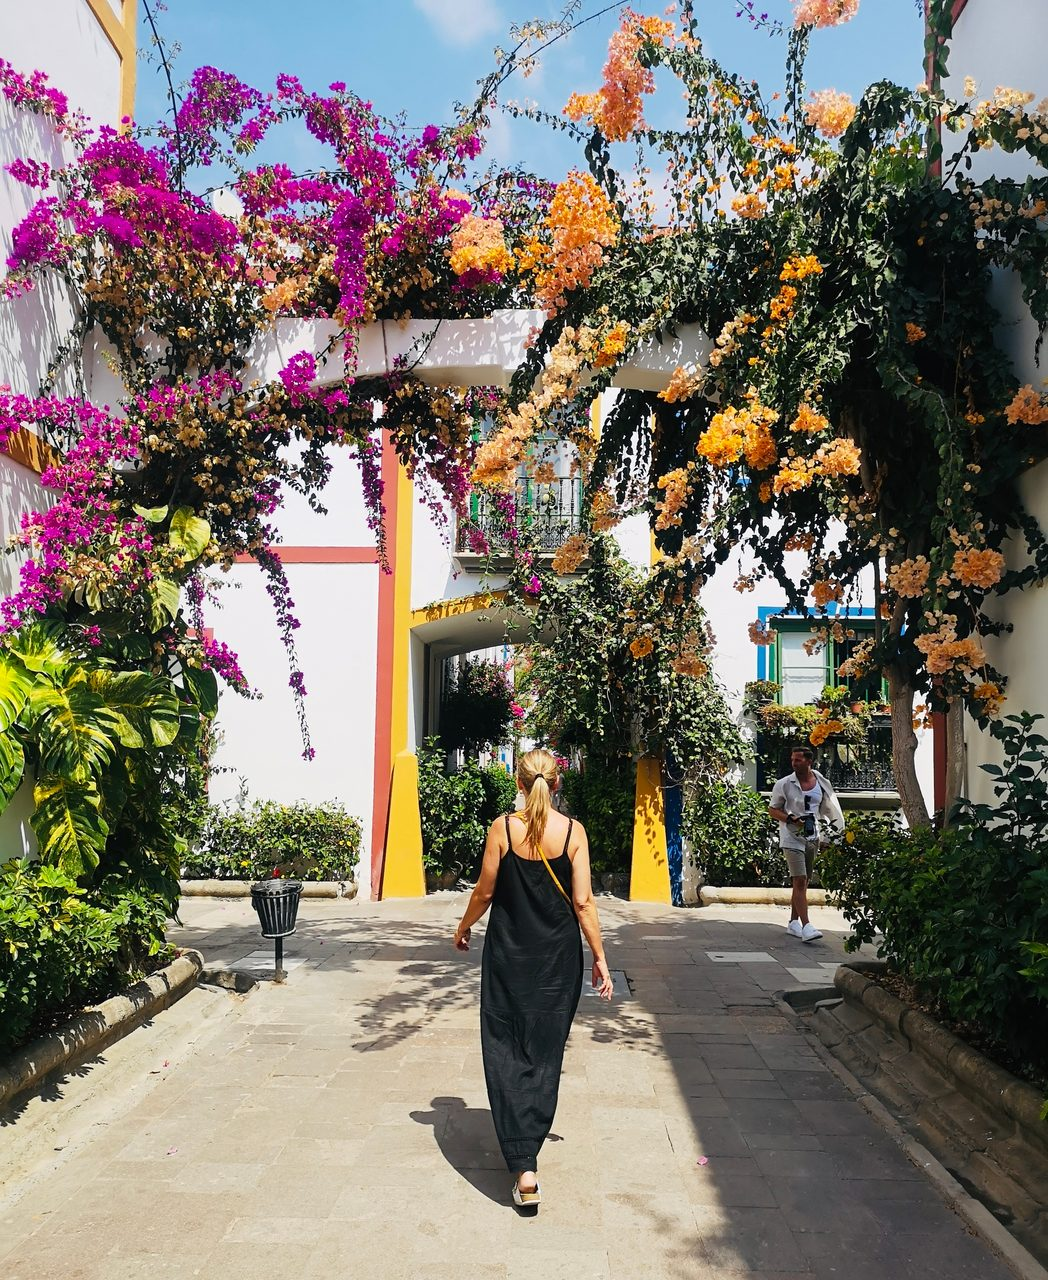 Road surface, Flower, Sky, Plant, Building, Leaf, Branch, Botany, Temple, Travel